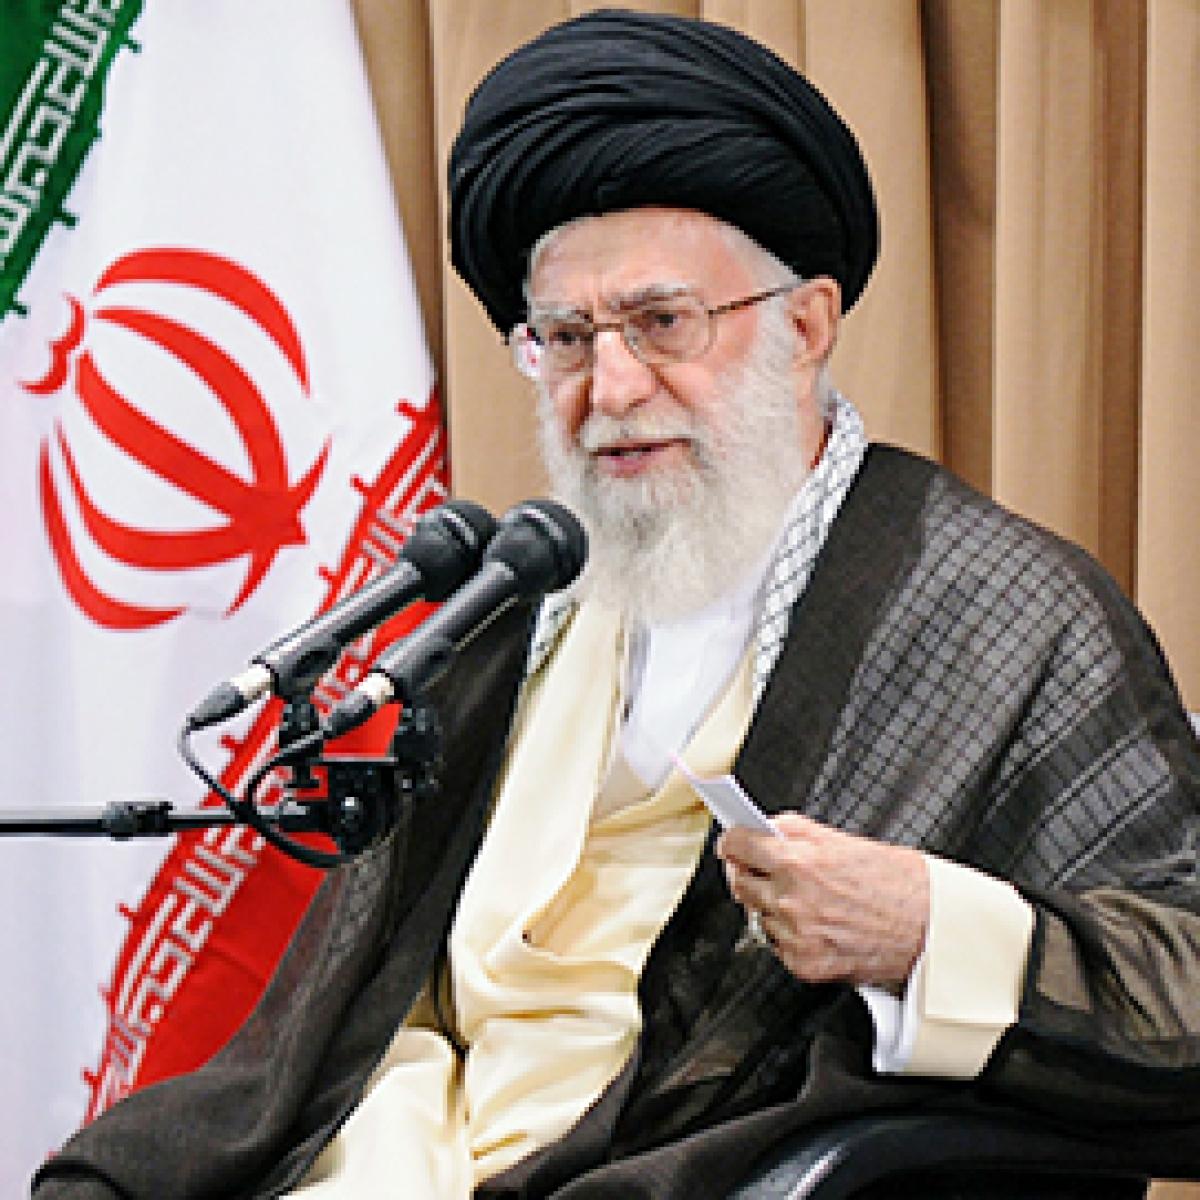 Iran's supreme leader Ayatollah Ali Khamenei vows 'severe revenge' for Qasem Soleimani killing